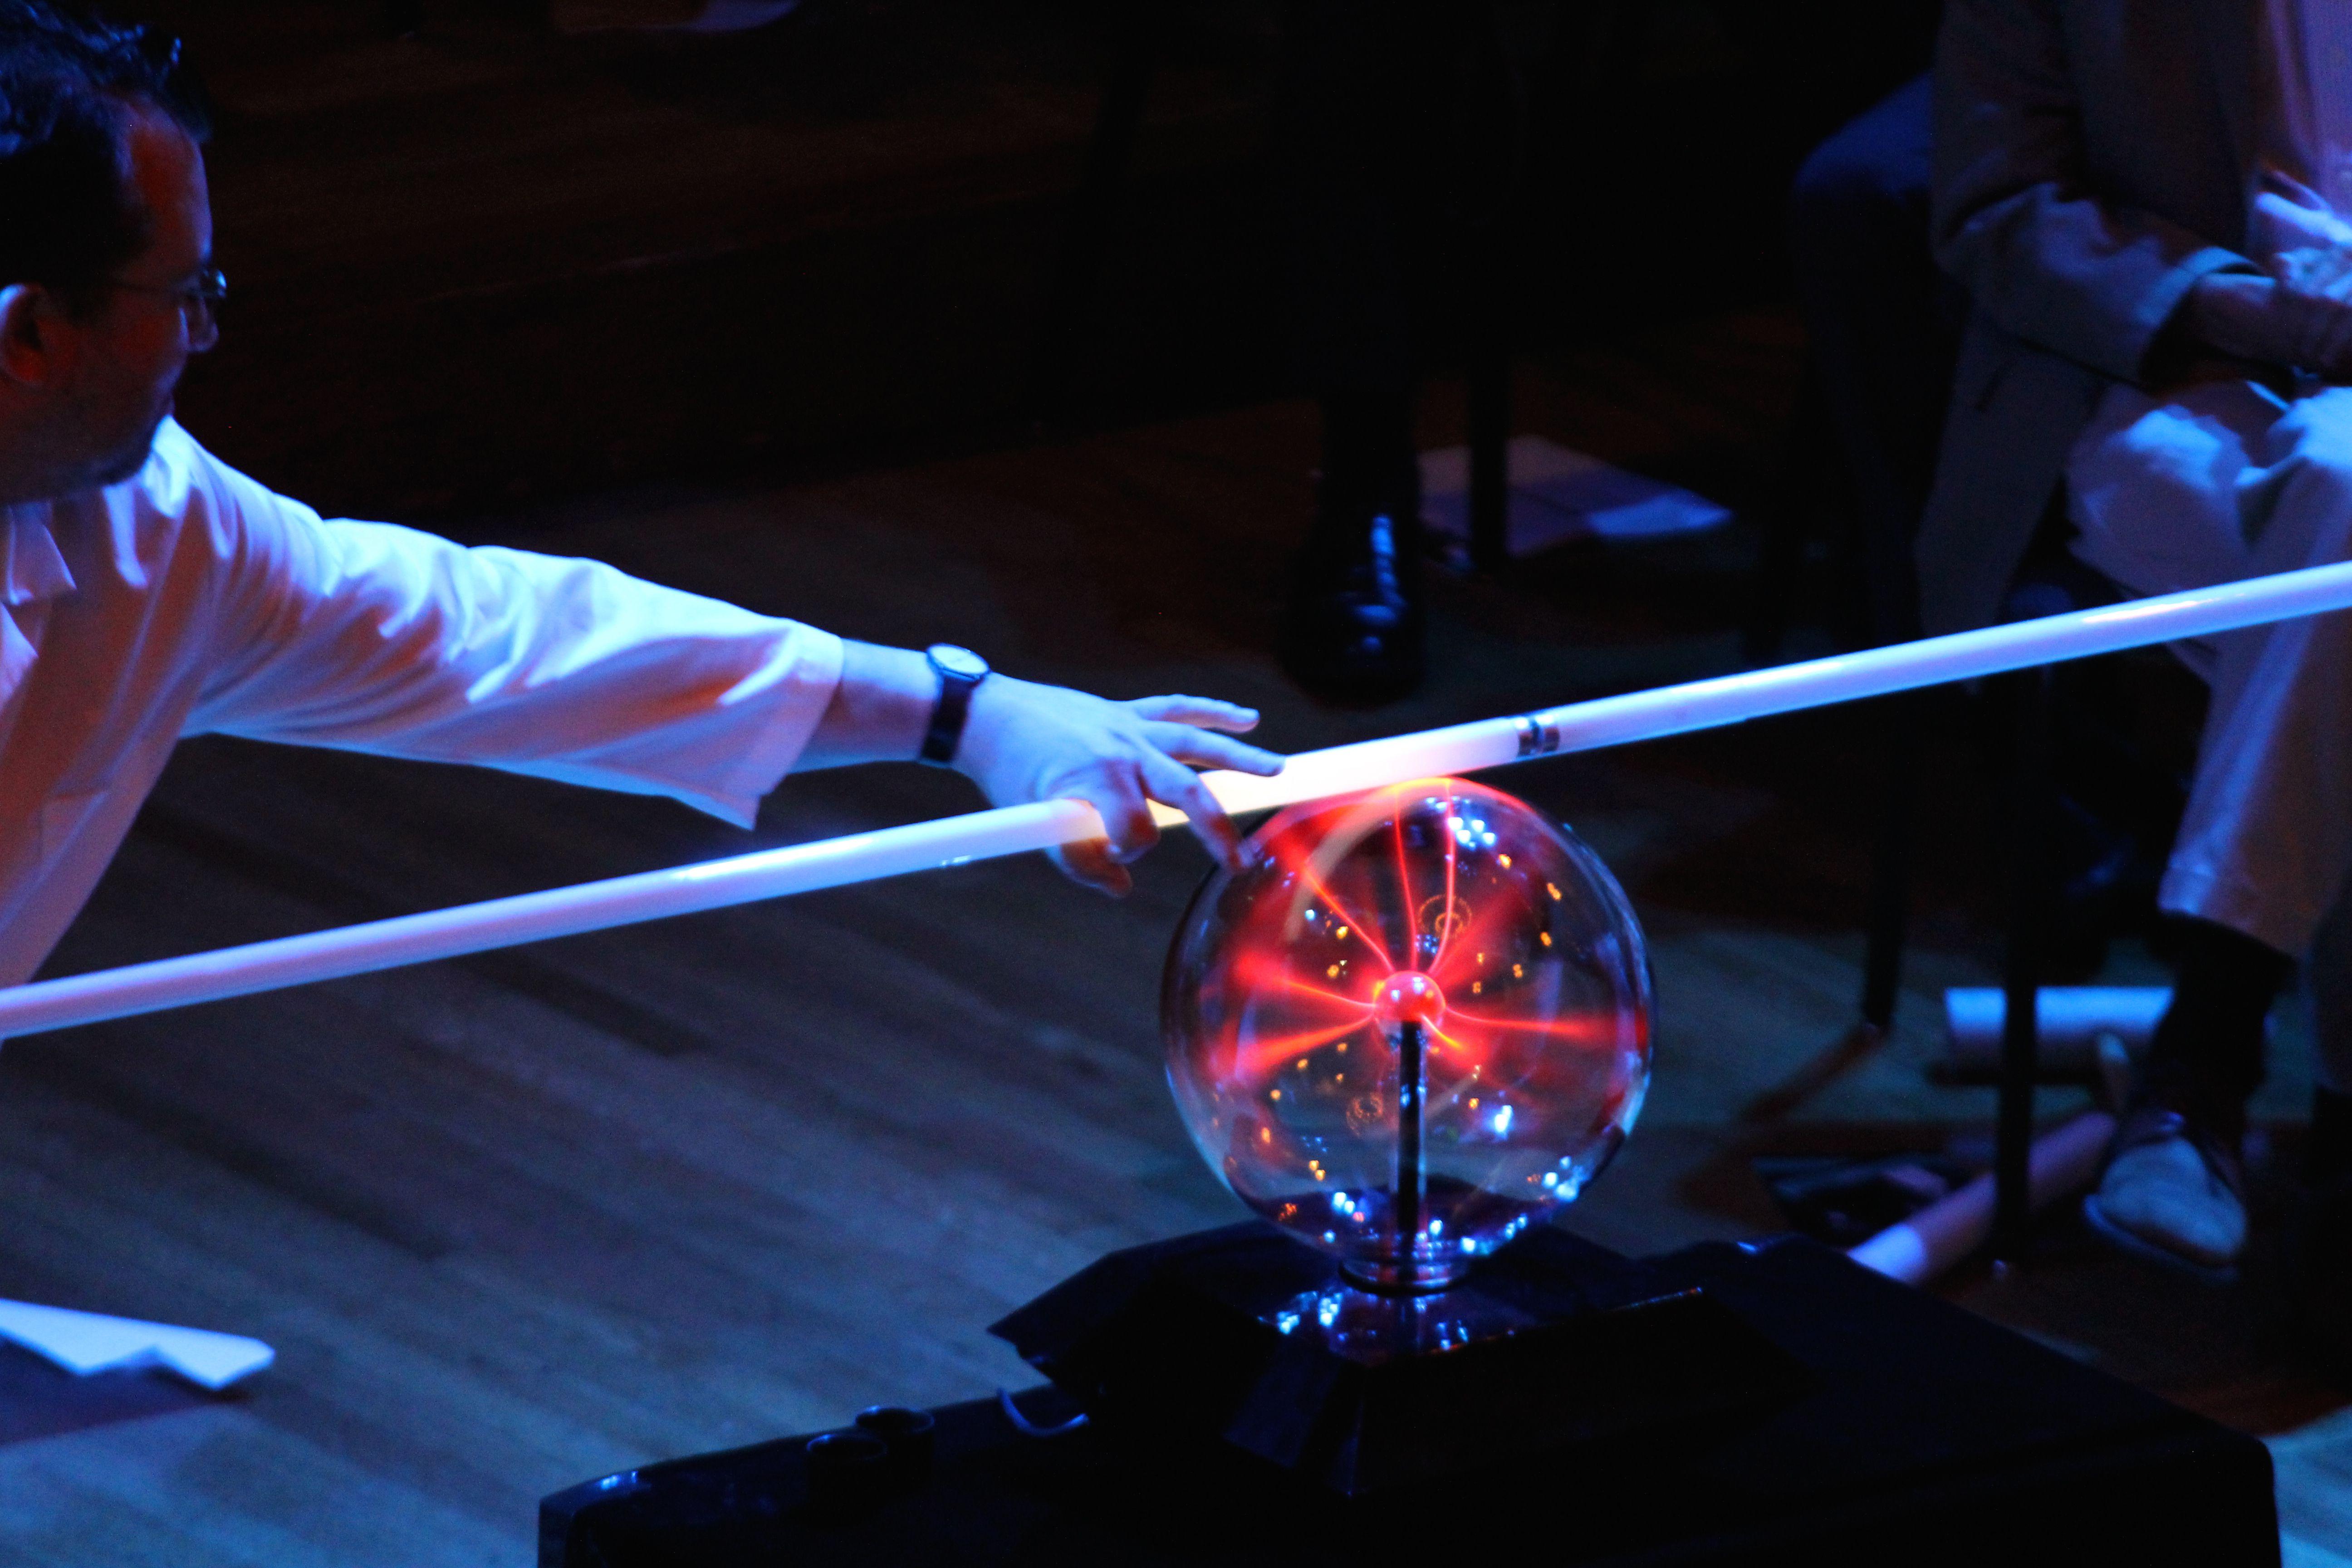 man using fluorescent light with a plasma ball